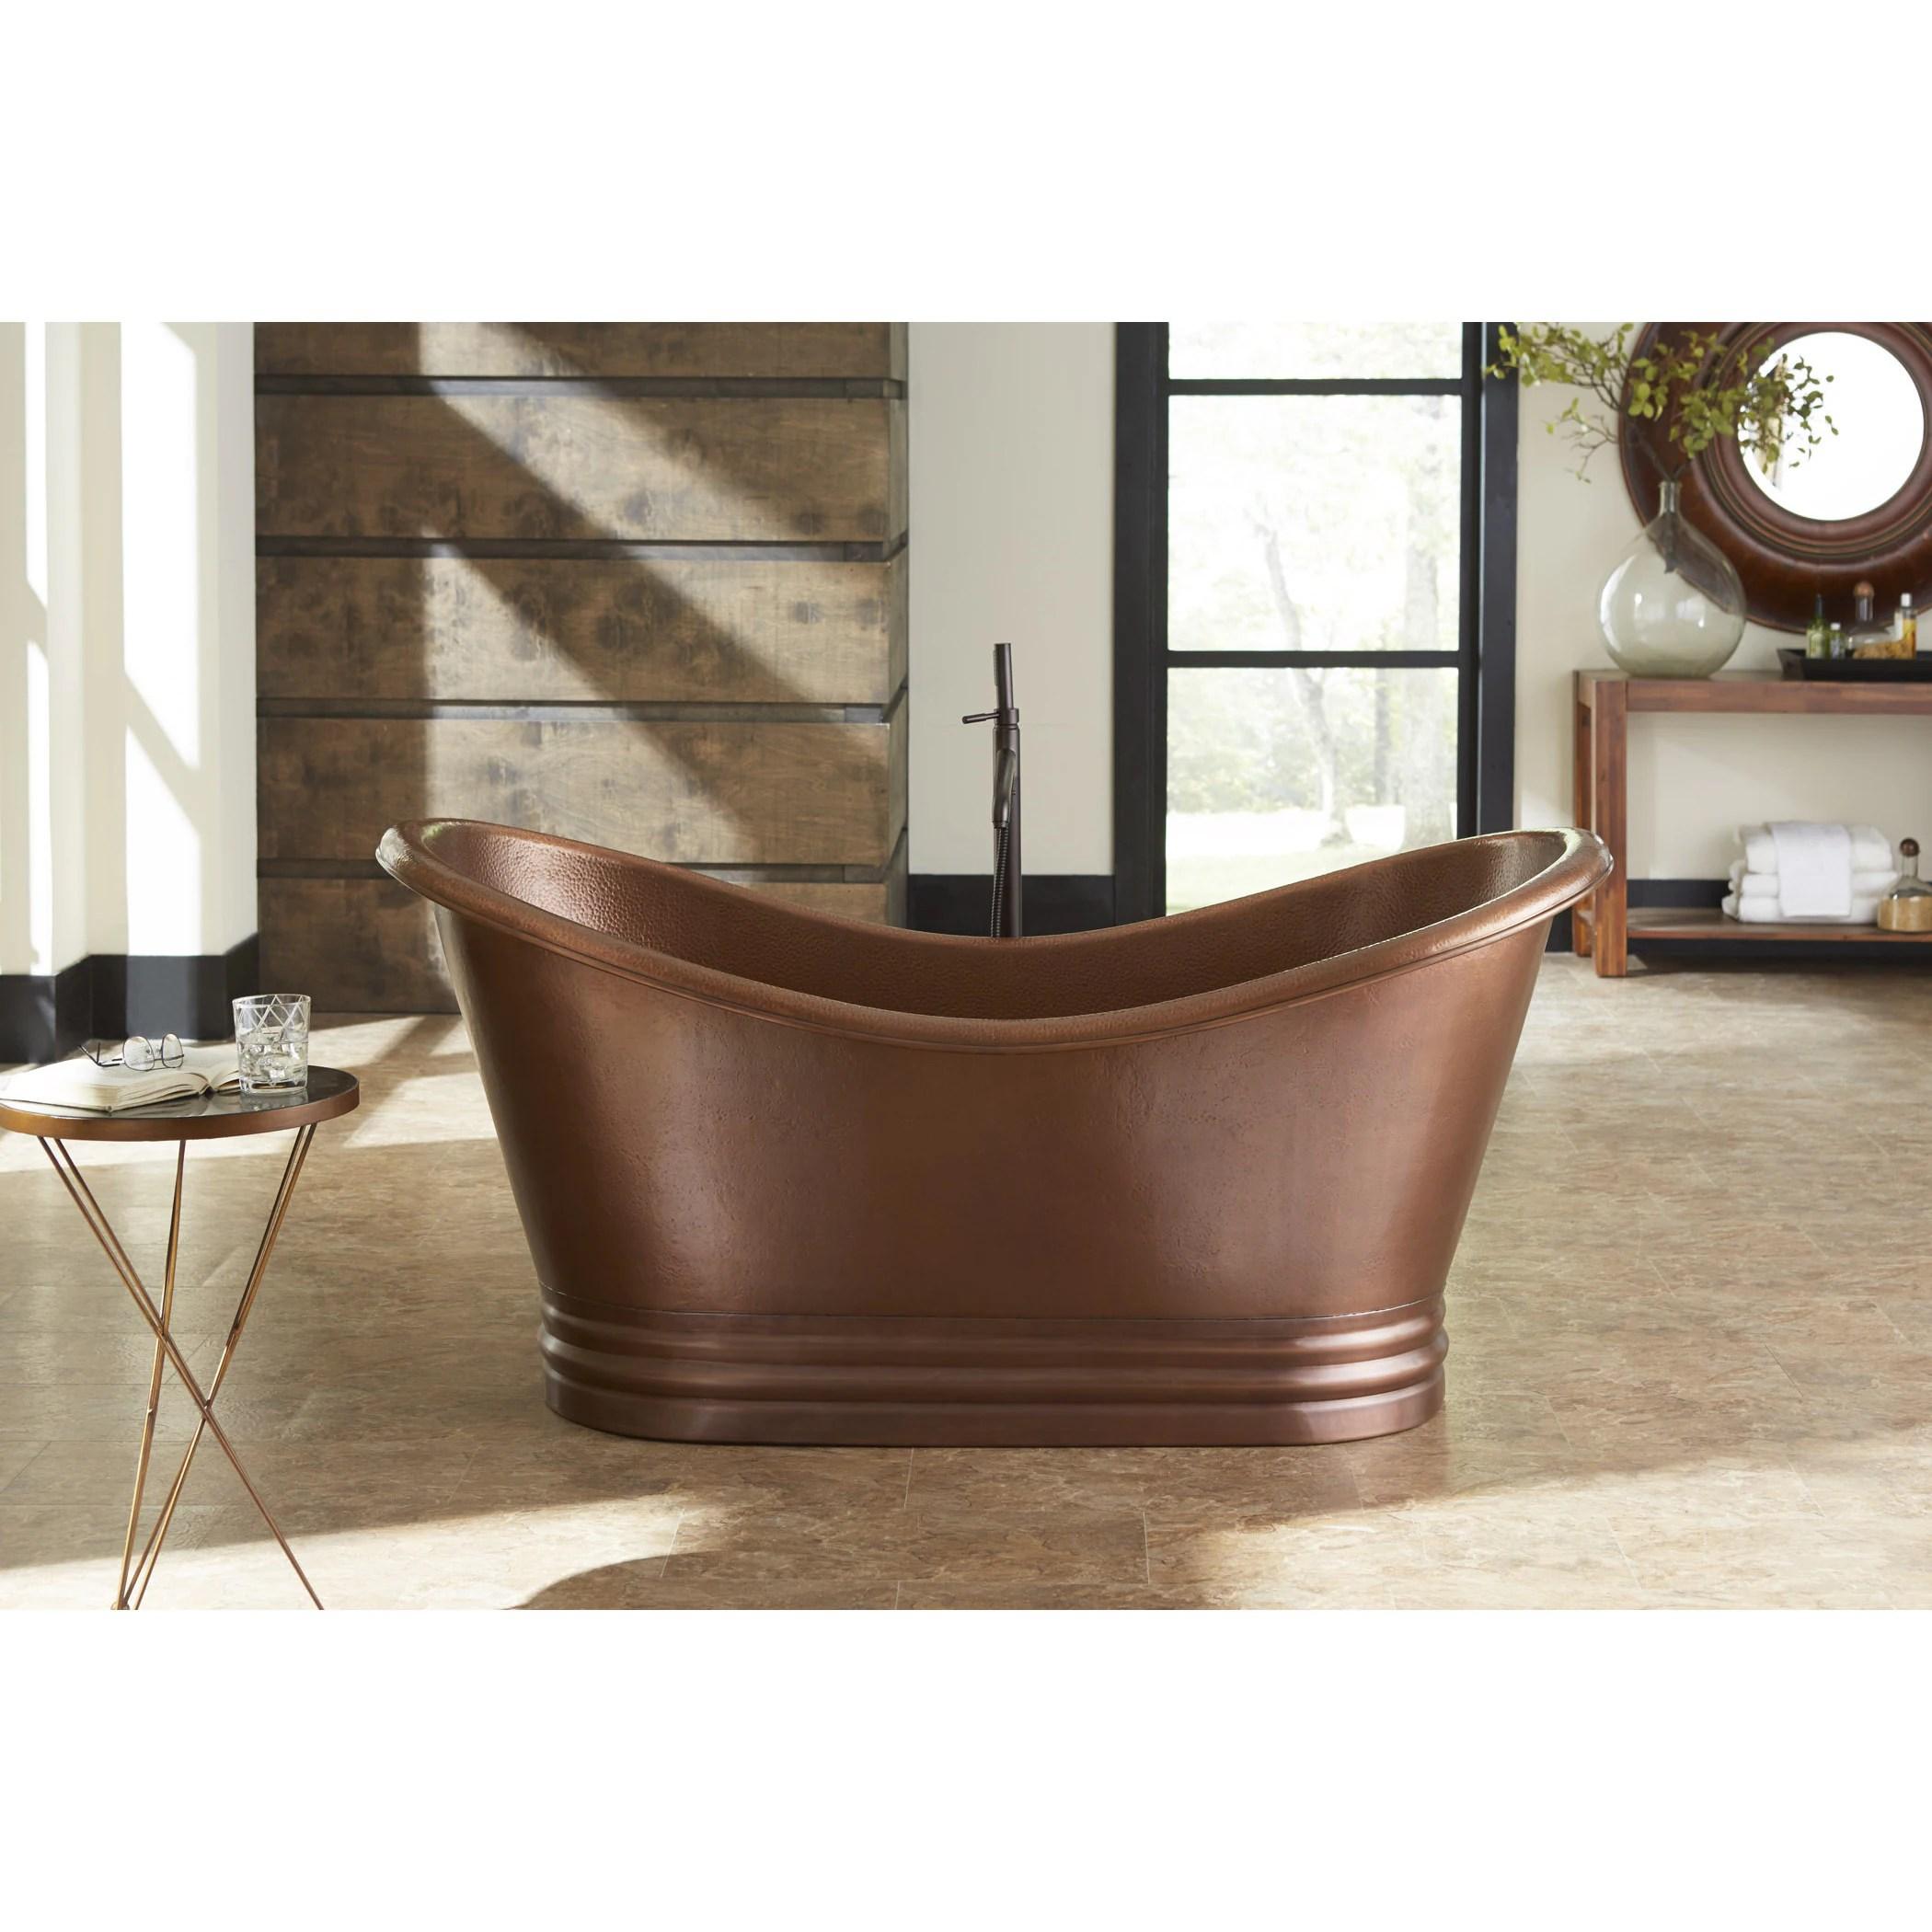 Shop Black Friday Deals On Sinkology Euclid Freestanding Bathtub 6 Foot Handmade Antique Copper Bathtub W Overflow Overstock 10561383